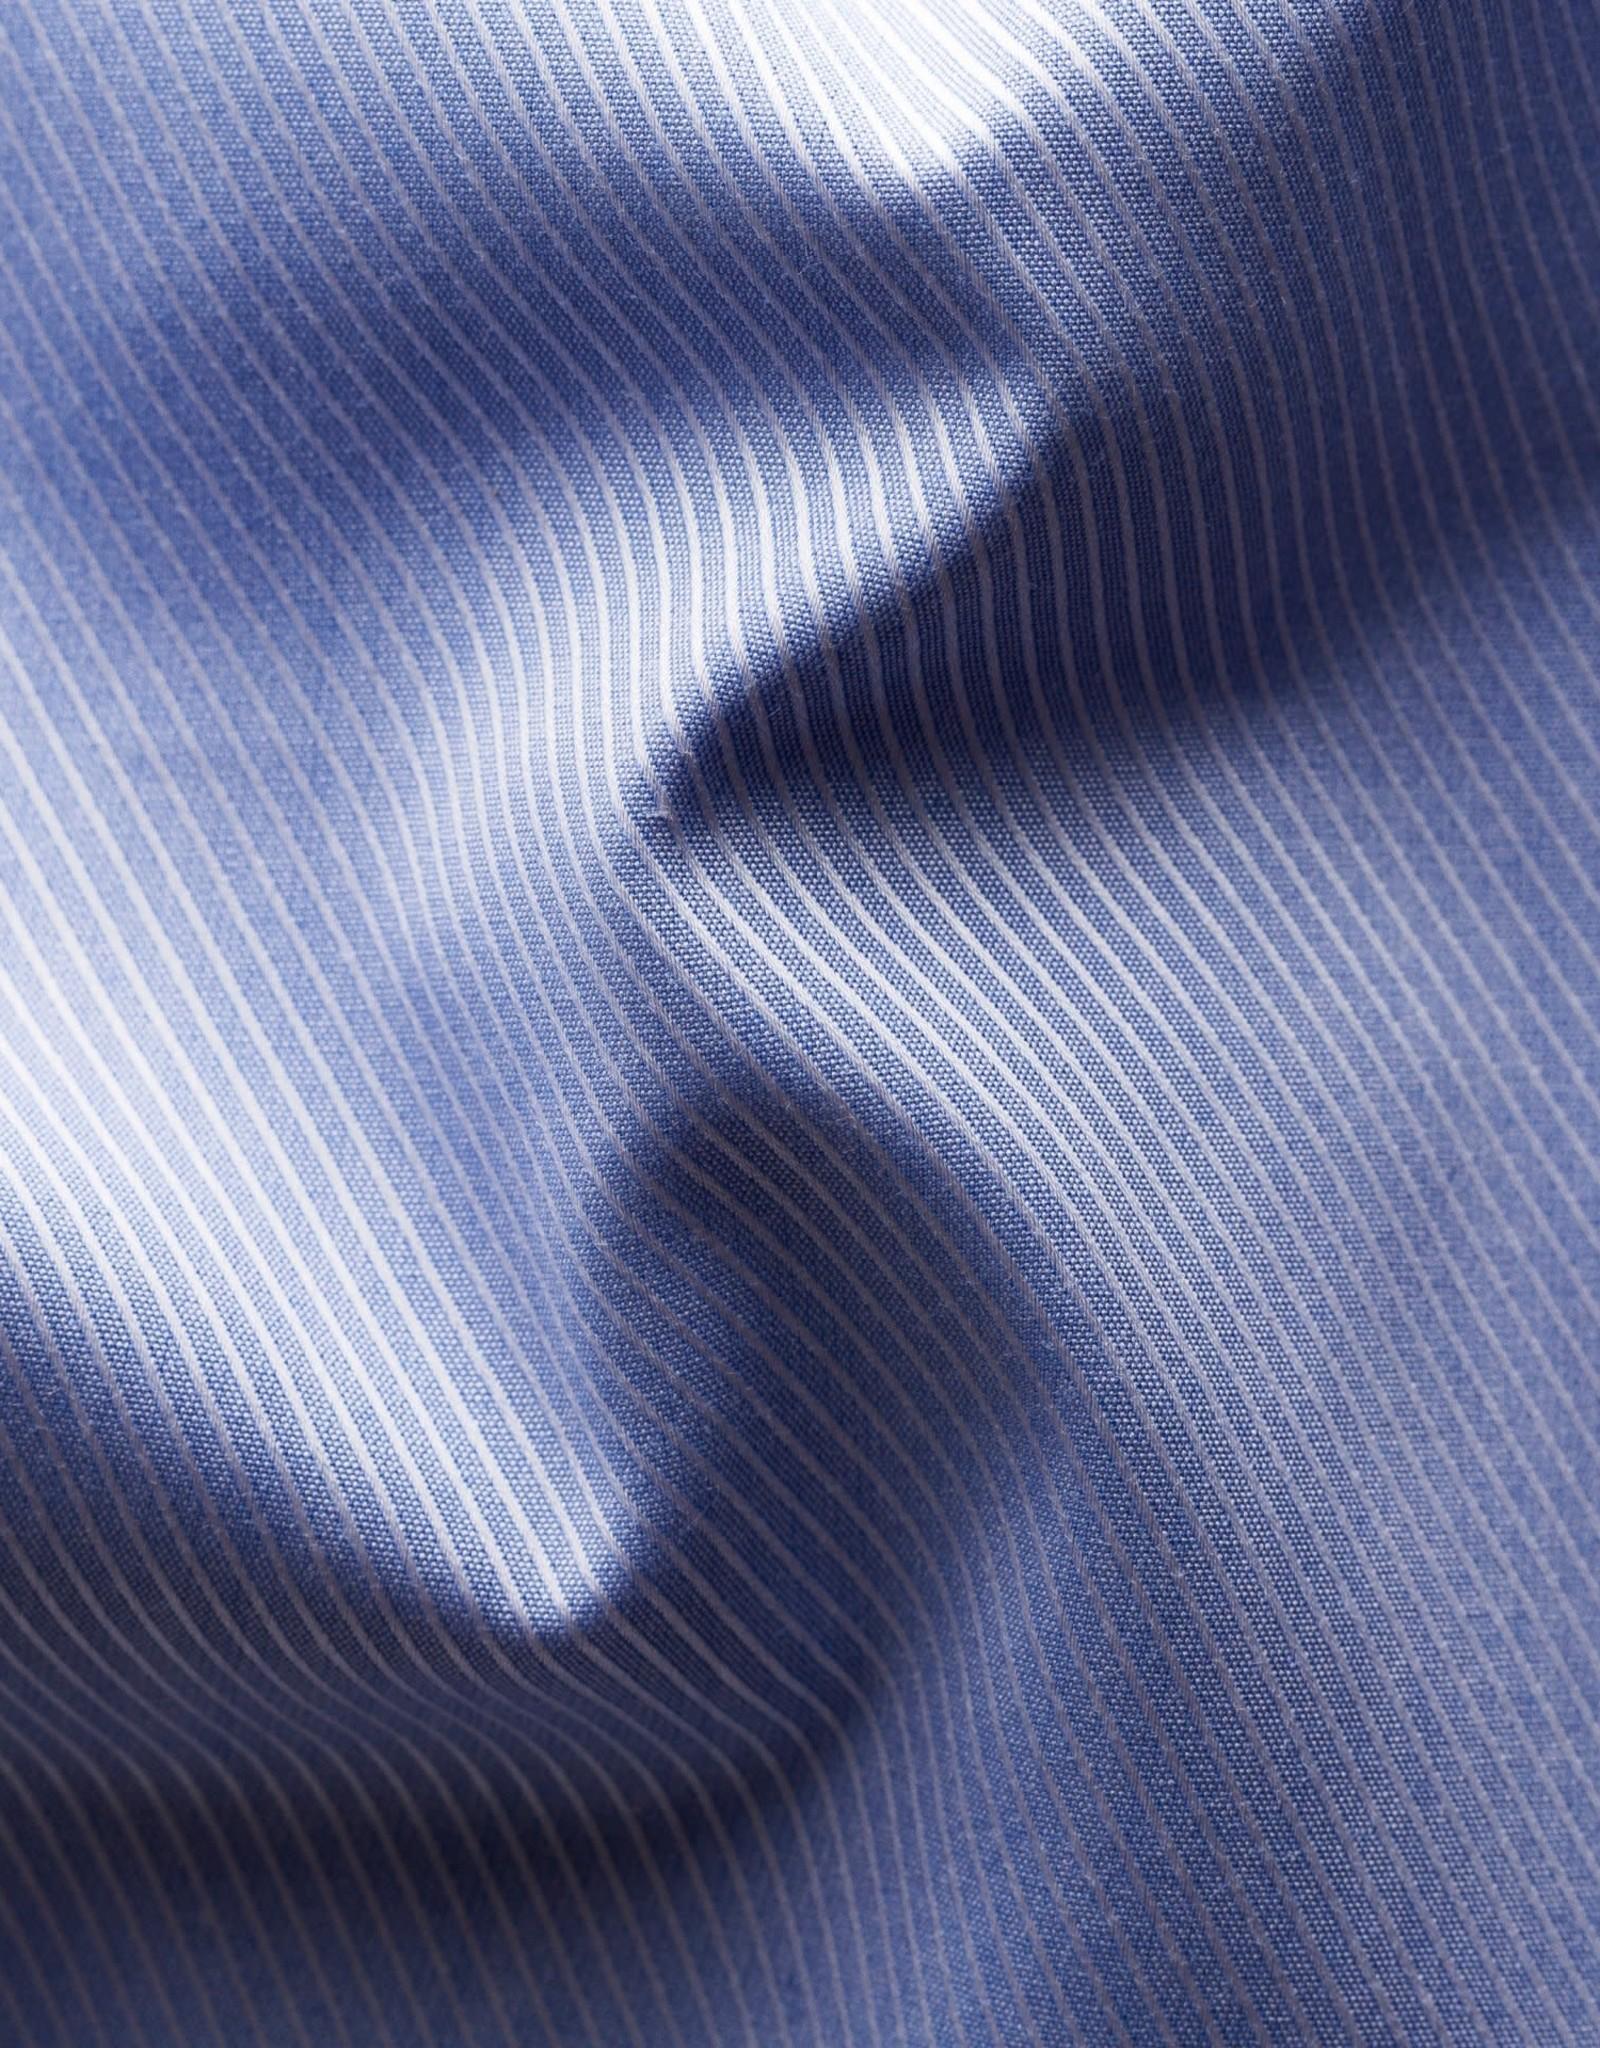 Eton Eton hemd blauw Slim fit 1773/21